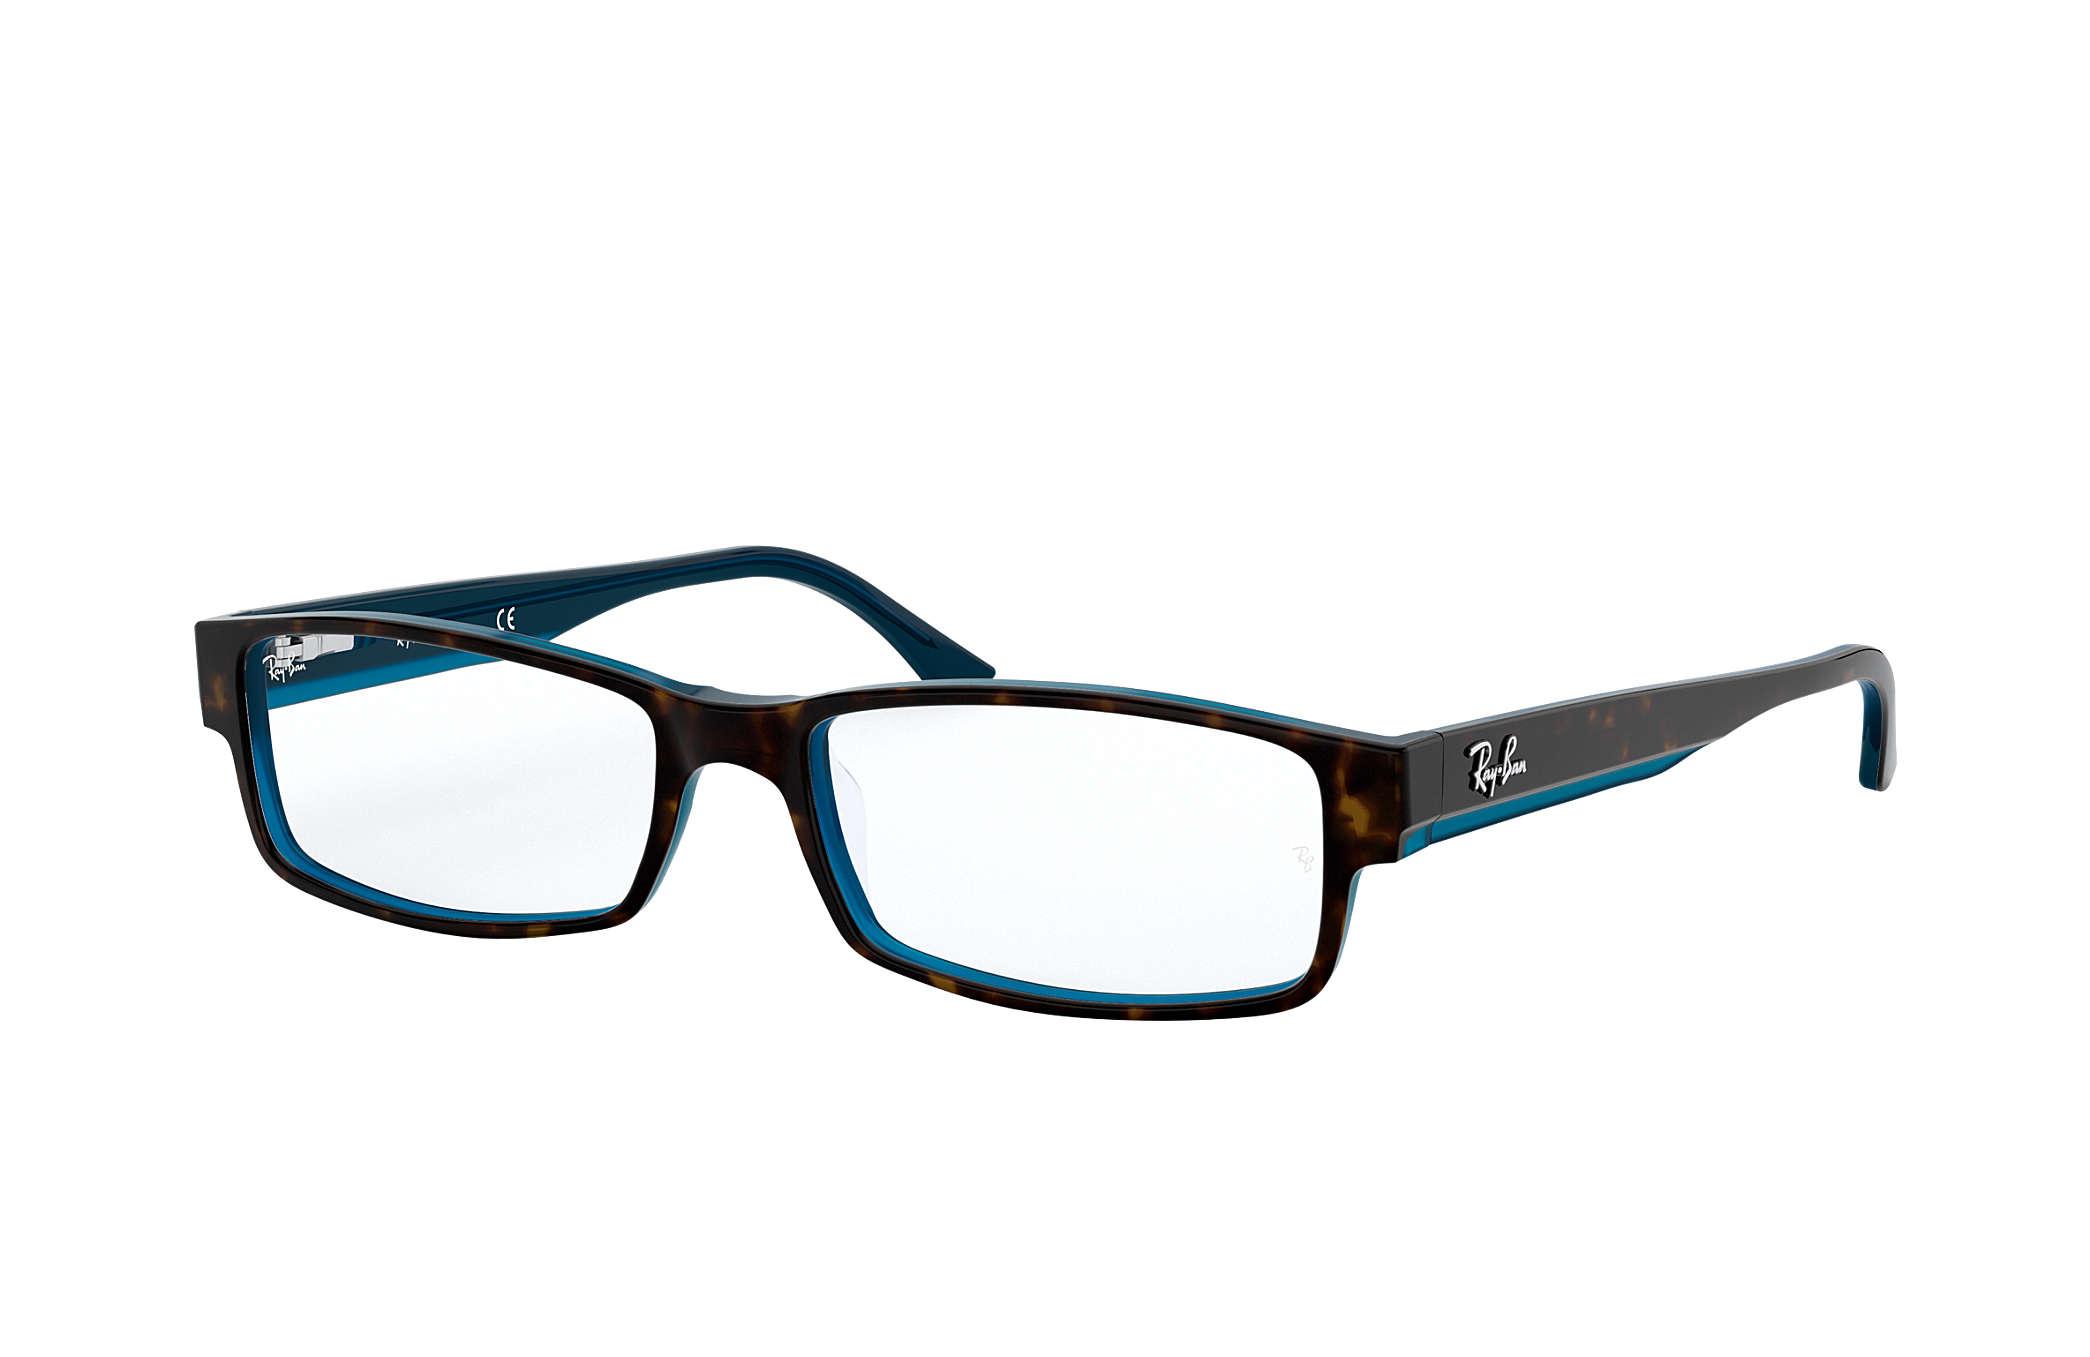 1ae83a94225 Ray-Ban prescription glasses RB5114 Tortoise - Acetate ...